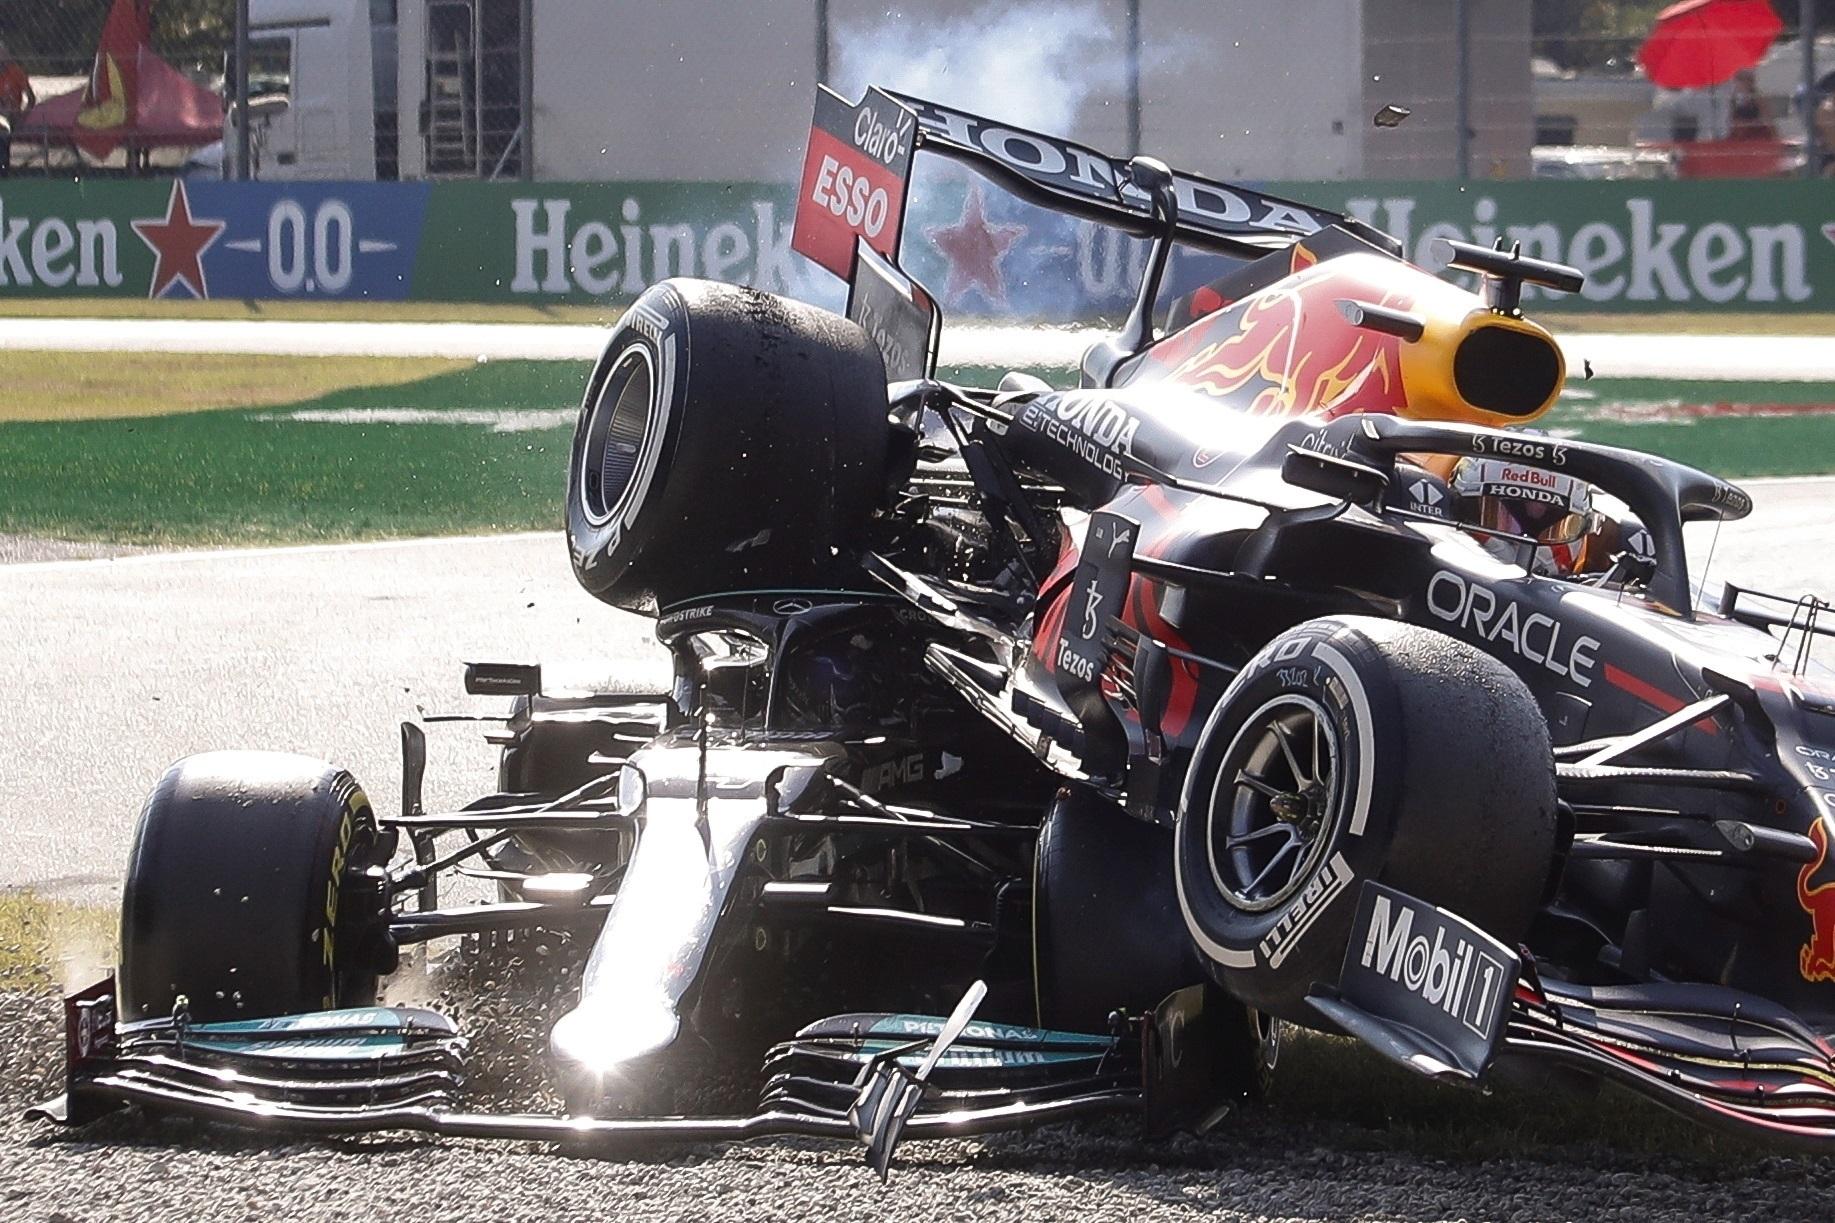 -FOTODELDÍA- MONZA (ITALIA), 12/09/2021.- El piloto holandés de Fórmula Uno Max lt;HIT gt;Verstappen lt;/HIT gt; (d), del equipo Red Bull Racing, sufre un accidente junto al piloto británico Lewis Hamilton (i), del equipo Mercedes-AMG Petronas, durante el Gran Premio de Fórmula Uno de Italia, este domingo en Monza. EFE/ Matteo Bazzi